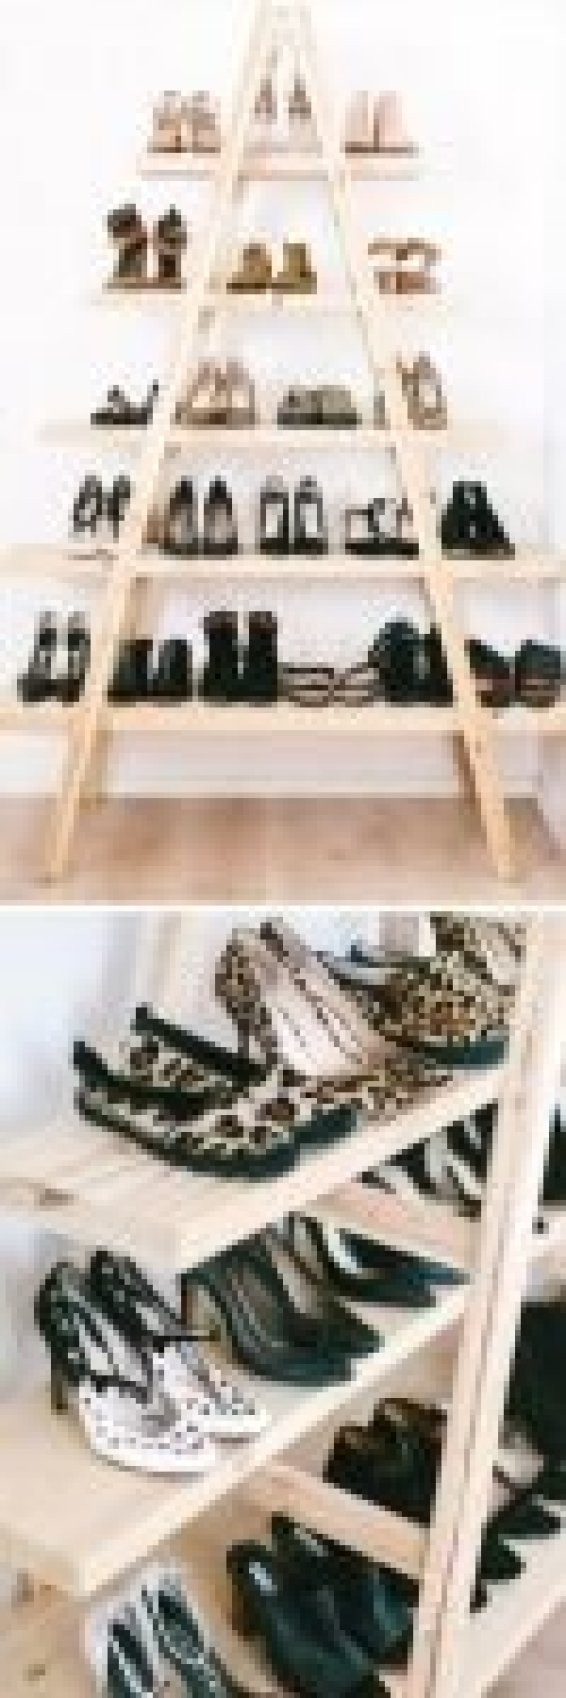 Unleash shoe storage ideas for college #shoestorageideas #shoerack #shoeorganizer